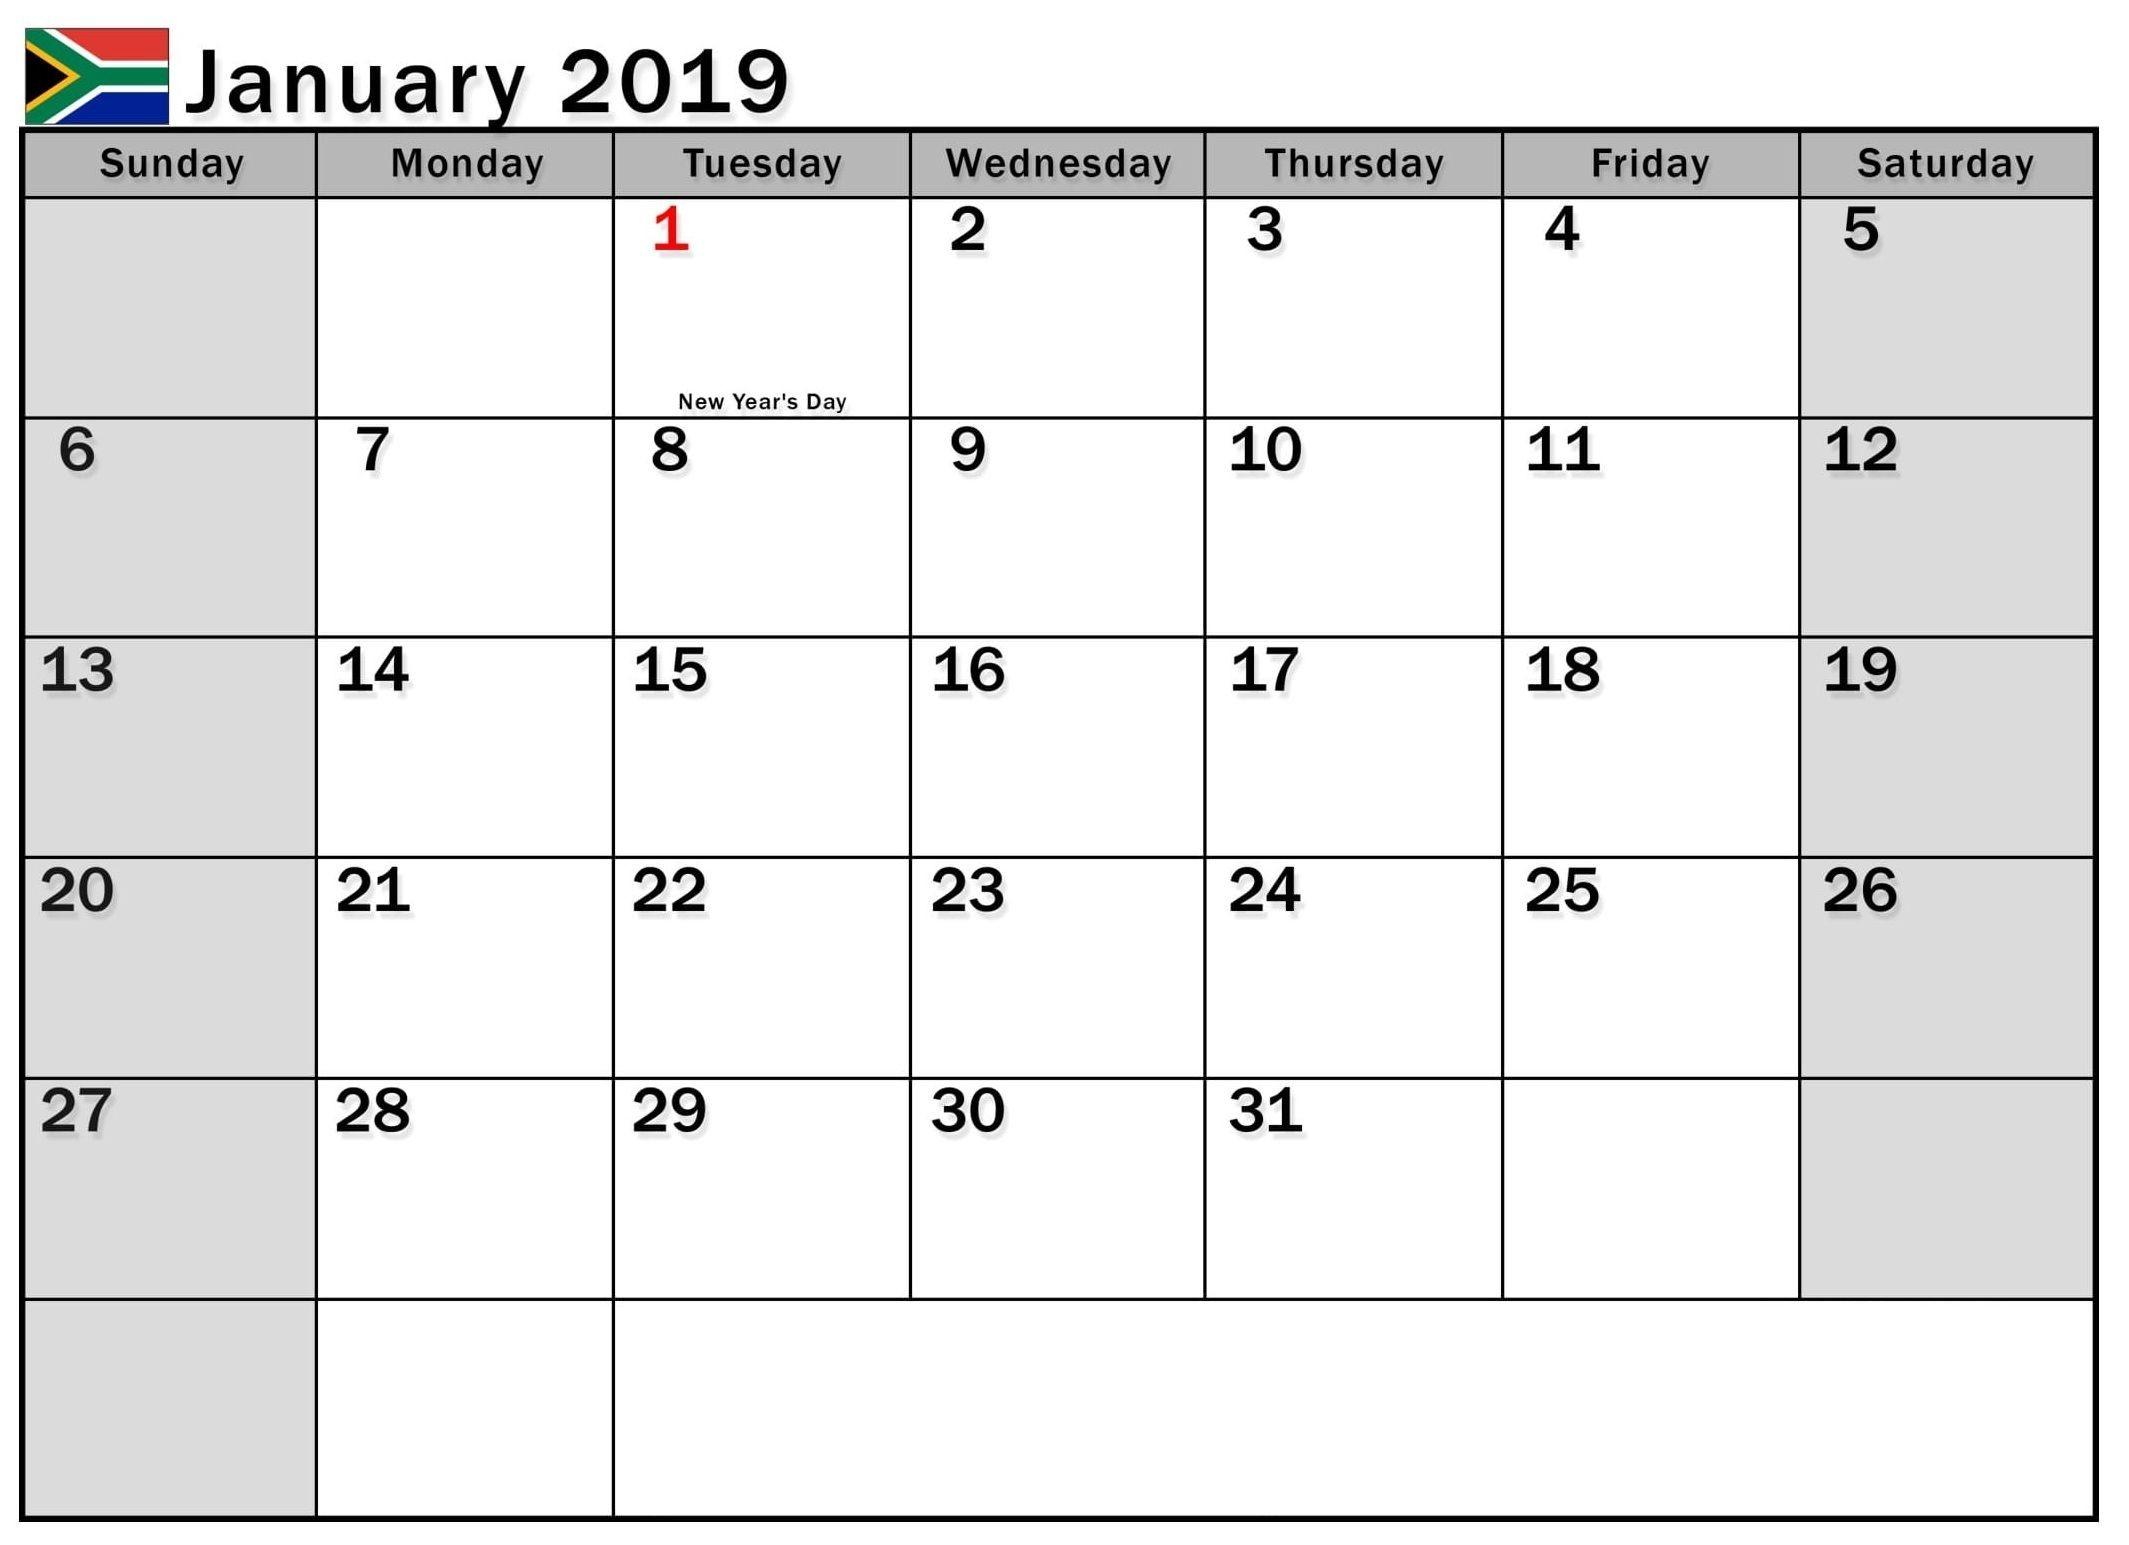 January 2019 Calendar With Holidays South Africa-January 2020 Calendar With Holidays South Africa